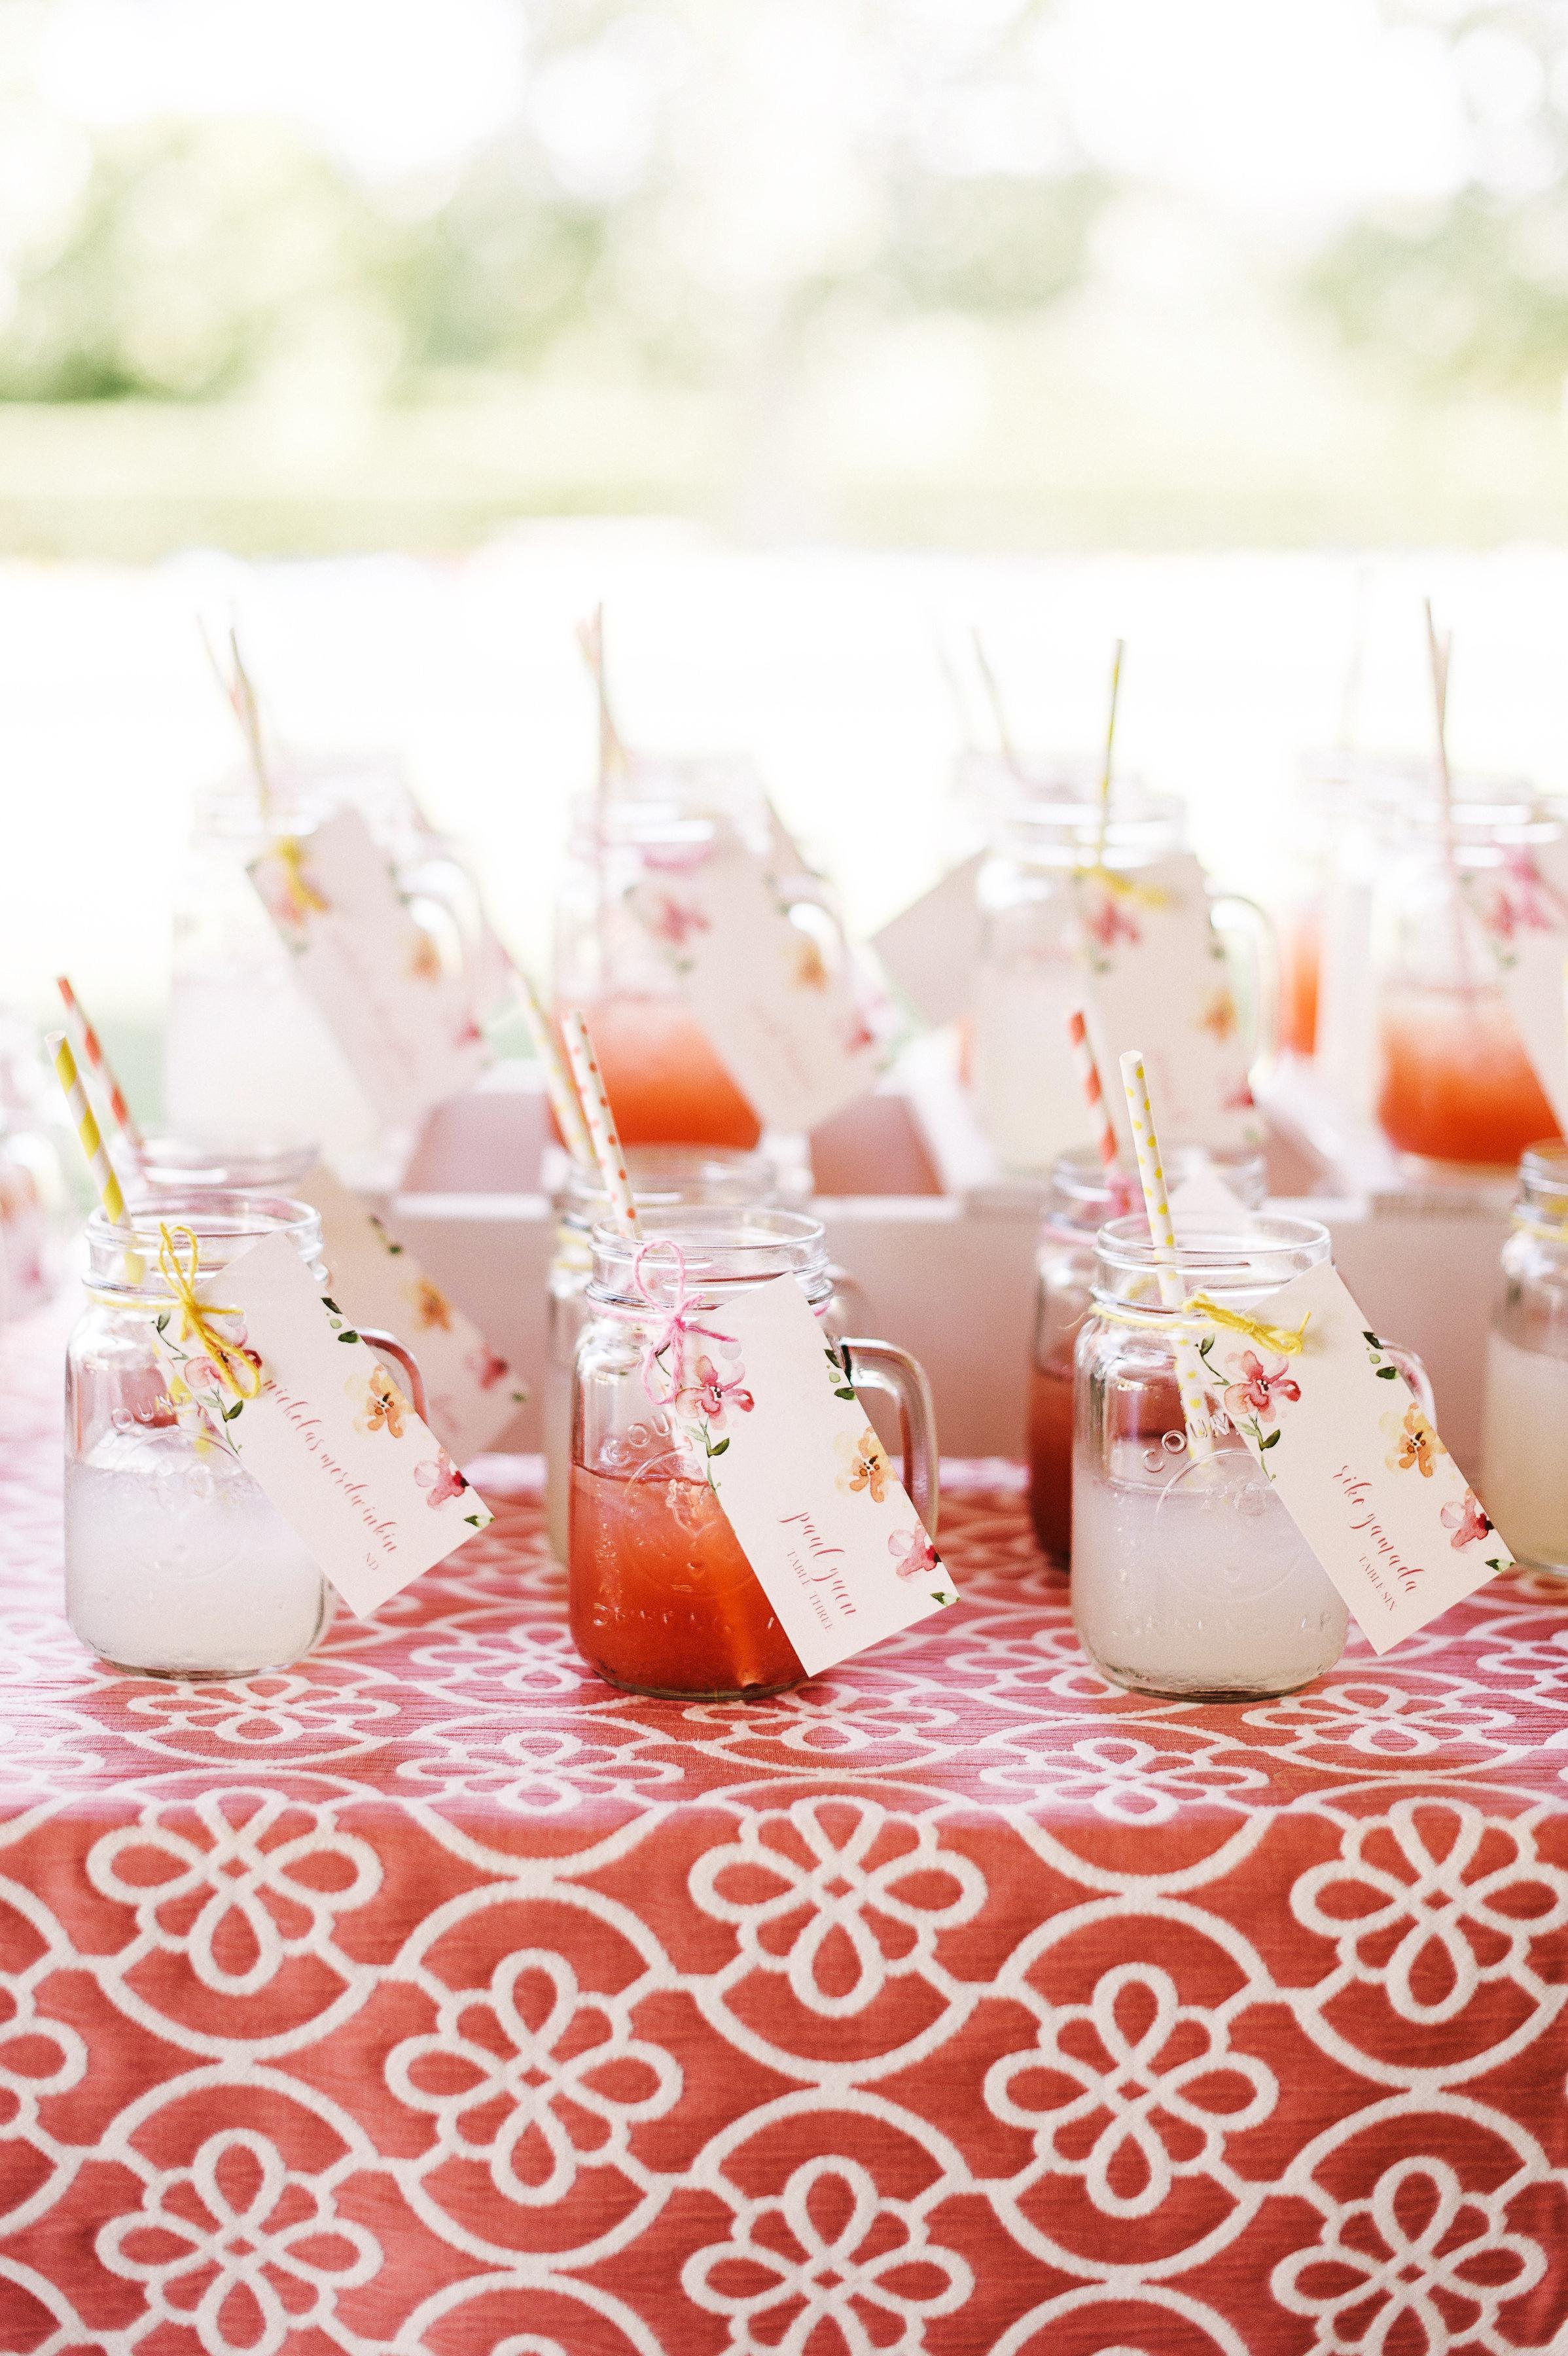 Mason jar wedding favors and signature cocktails